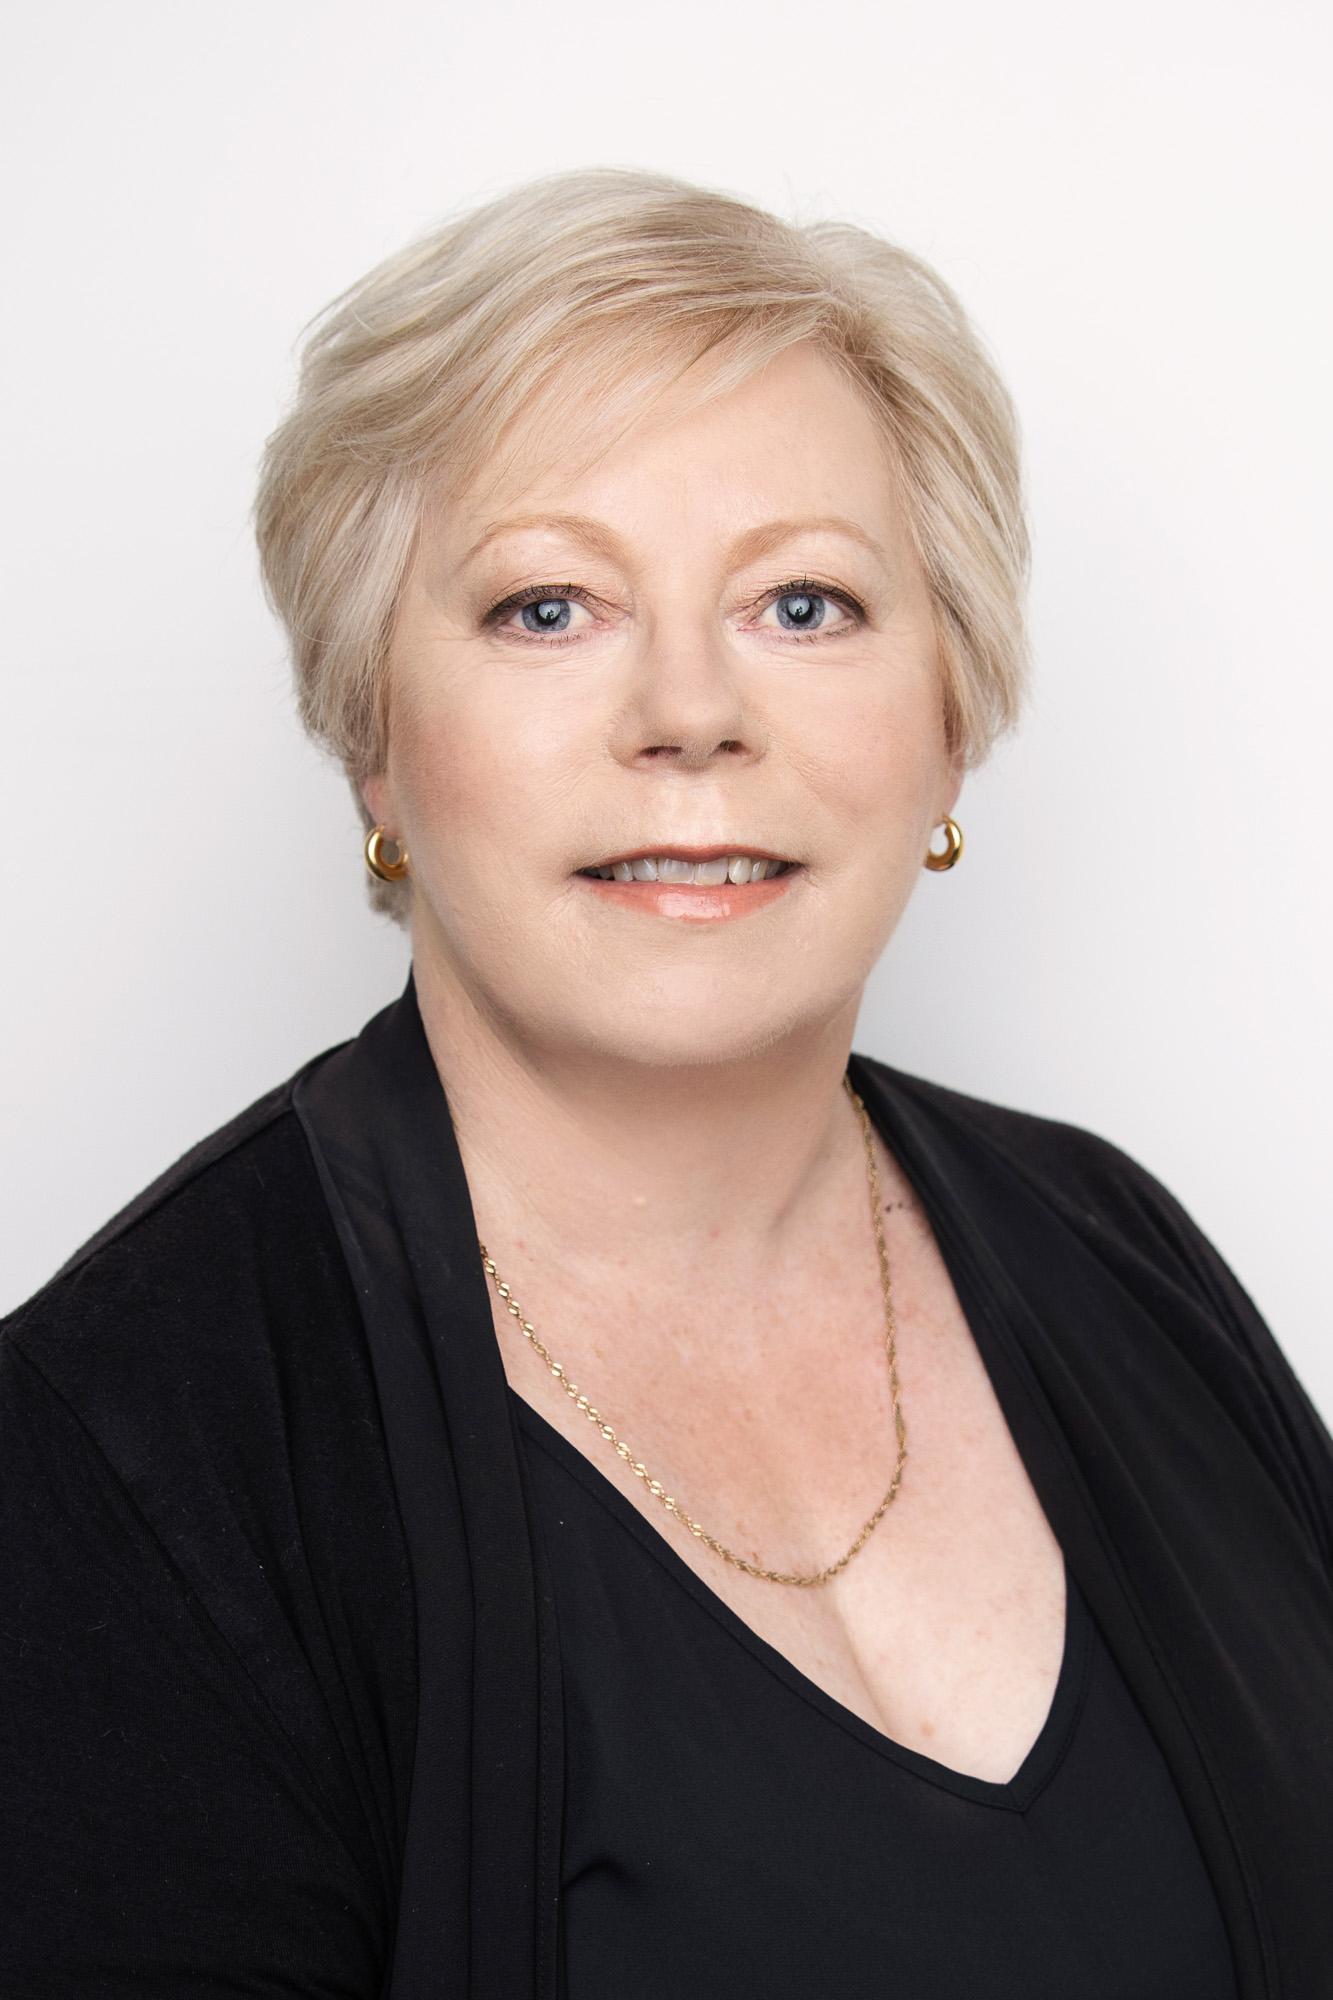 Jenny Pilkington